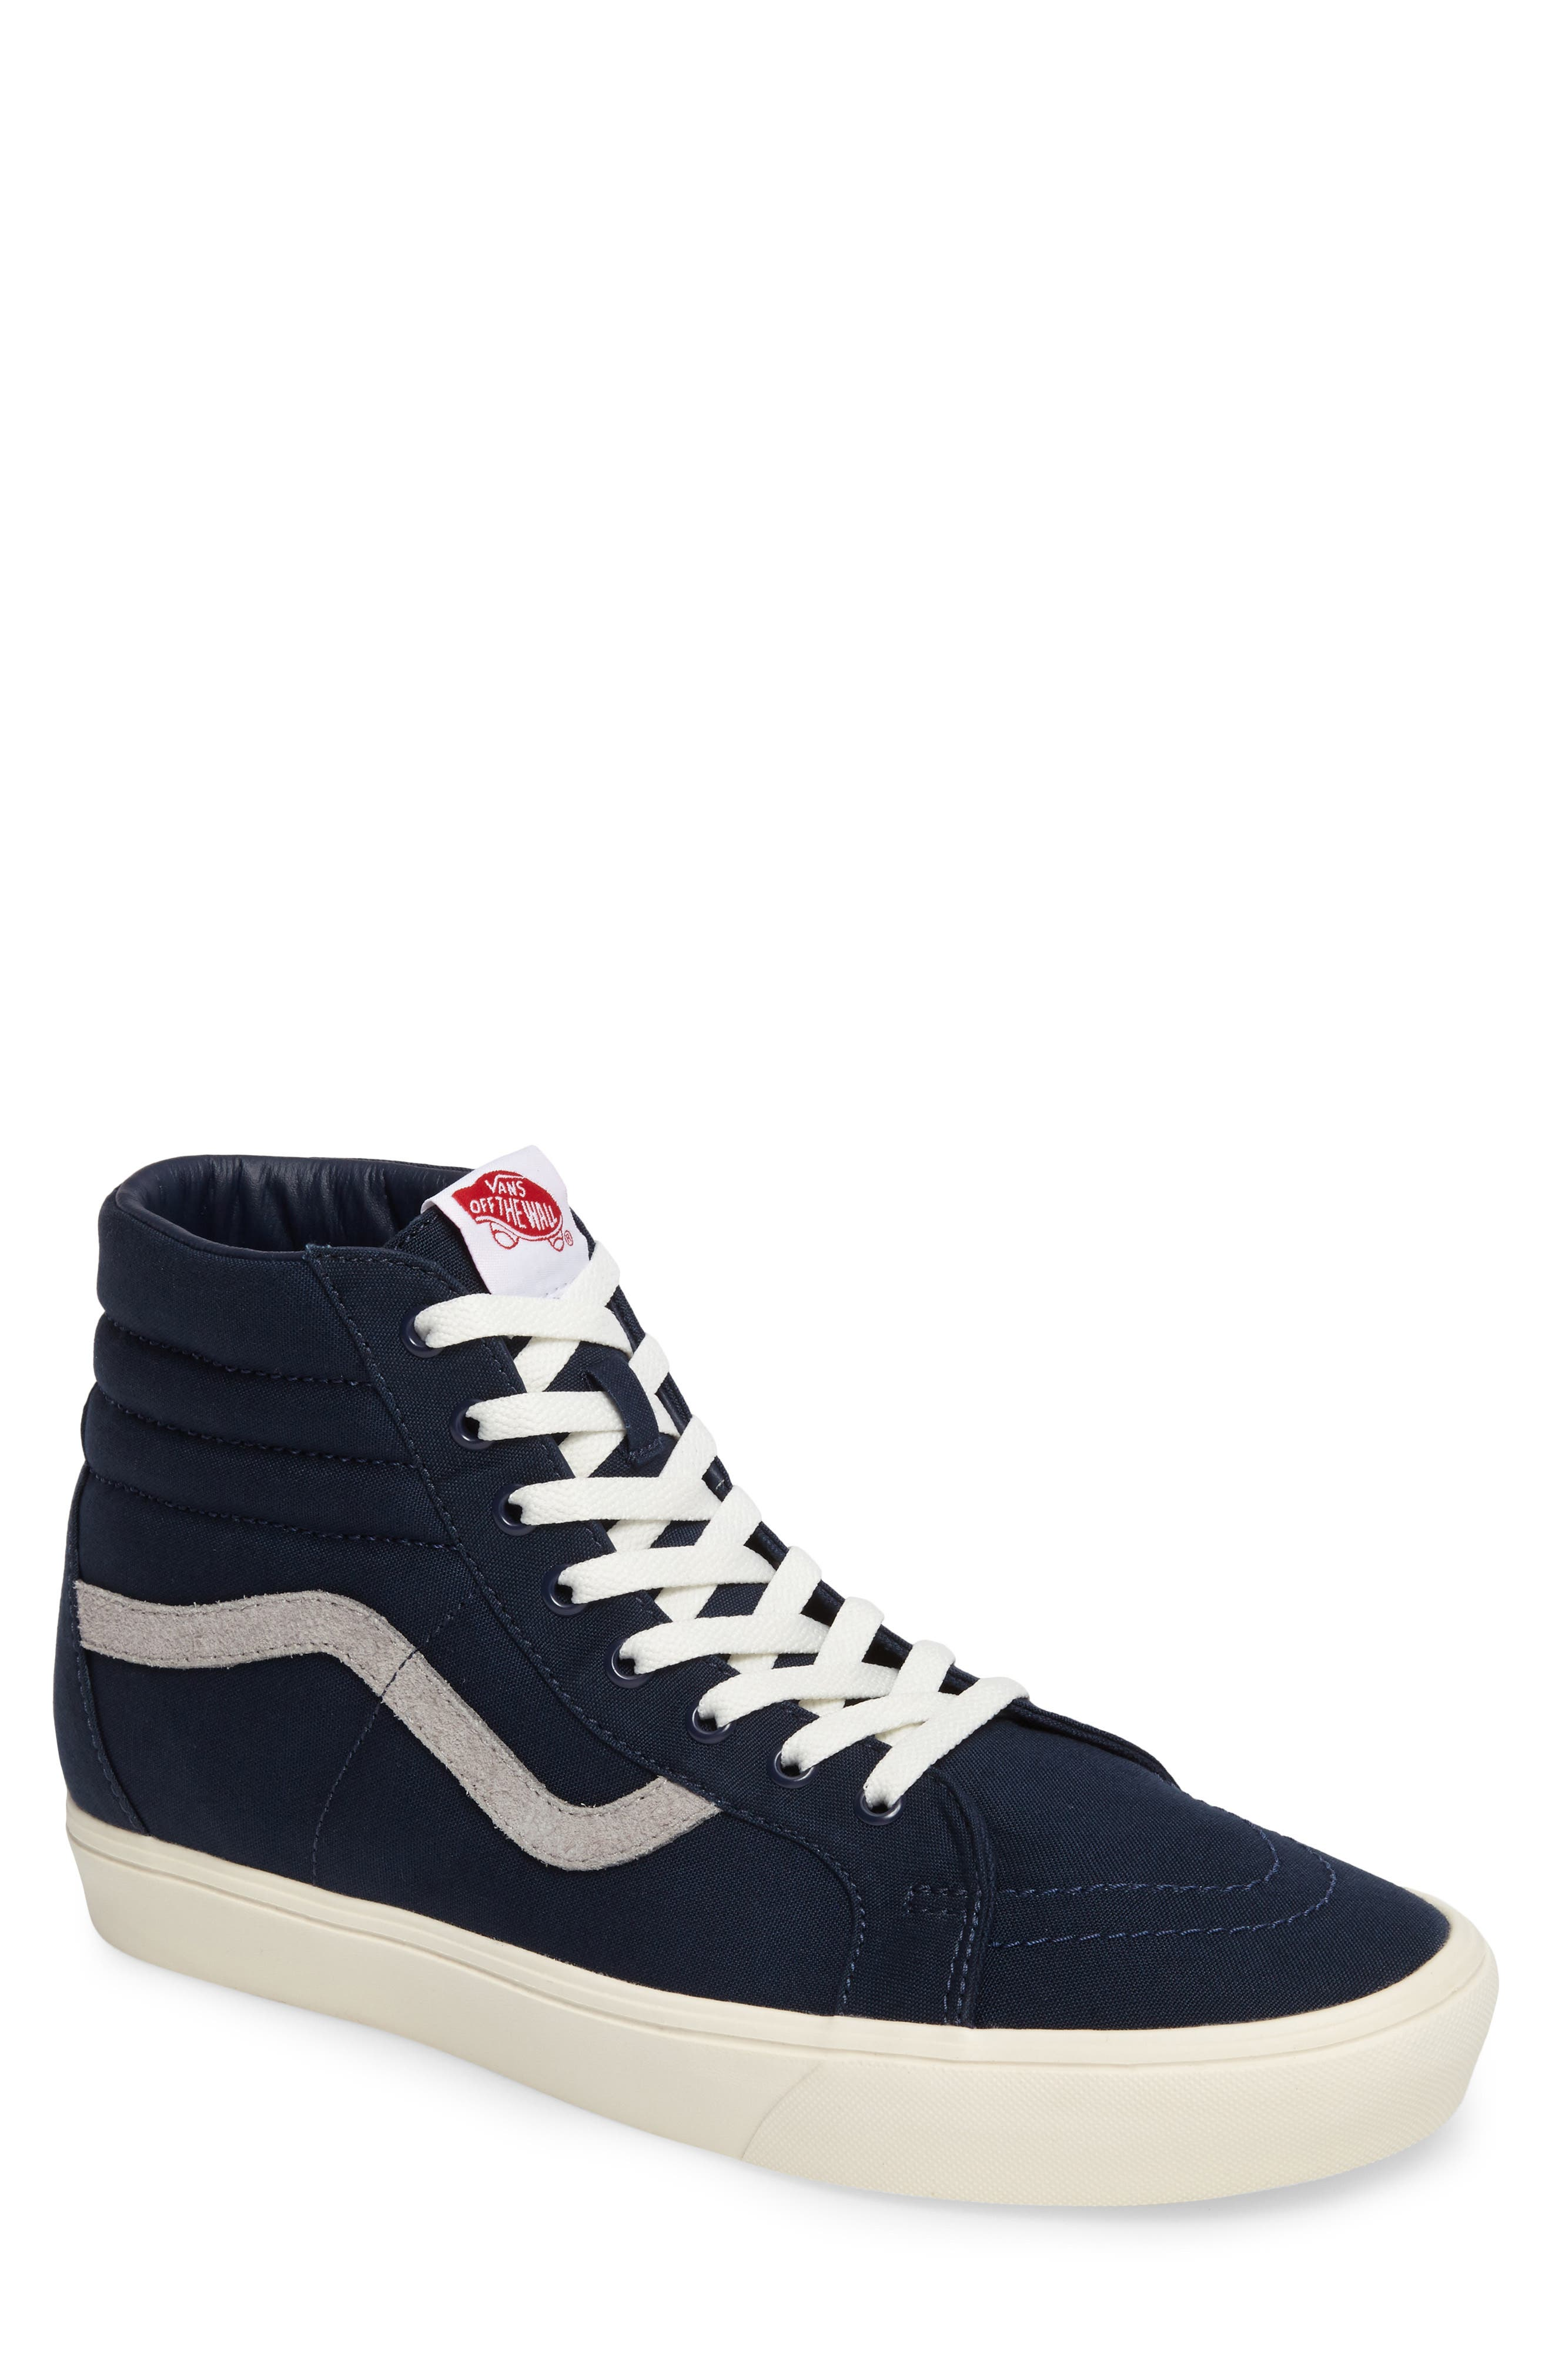 Sk80-Hi Reissue Lite Sneaker,                             Main thumbnail 1, color,                             420